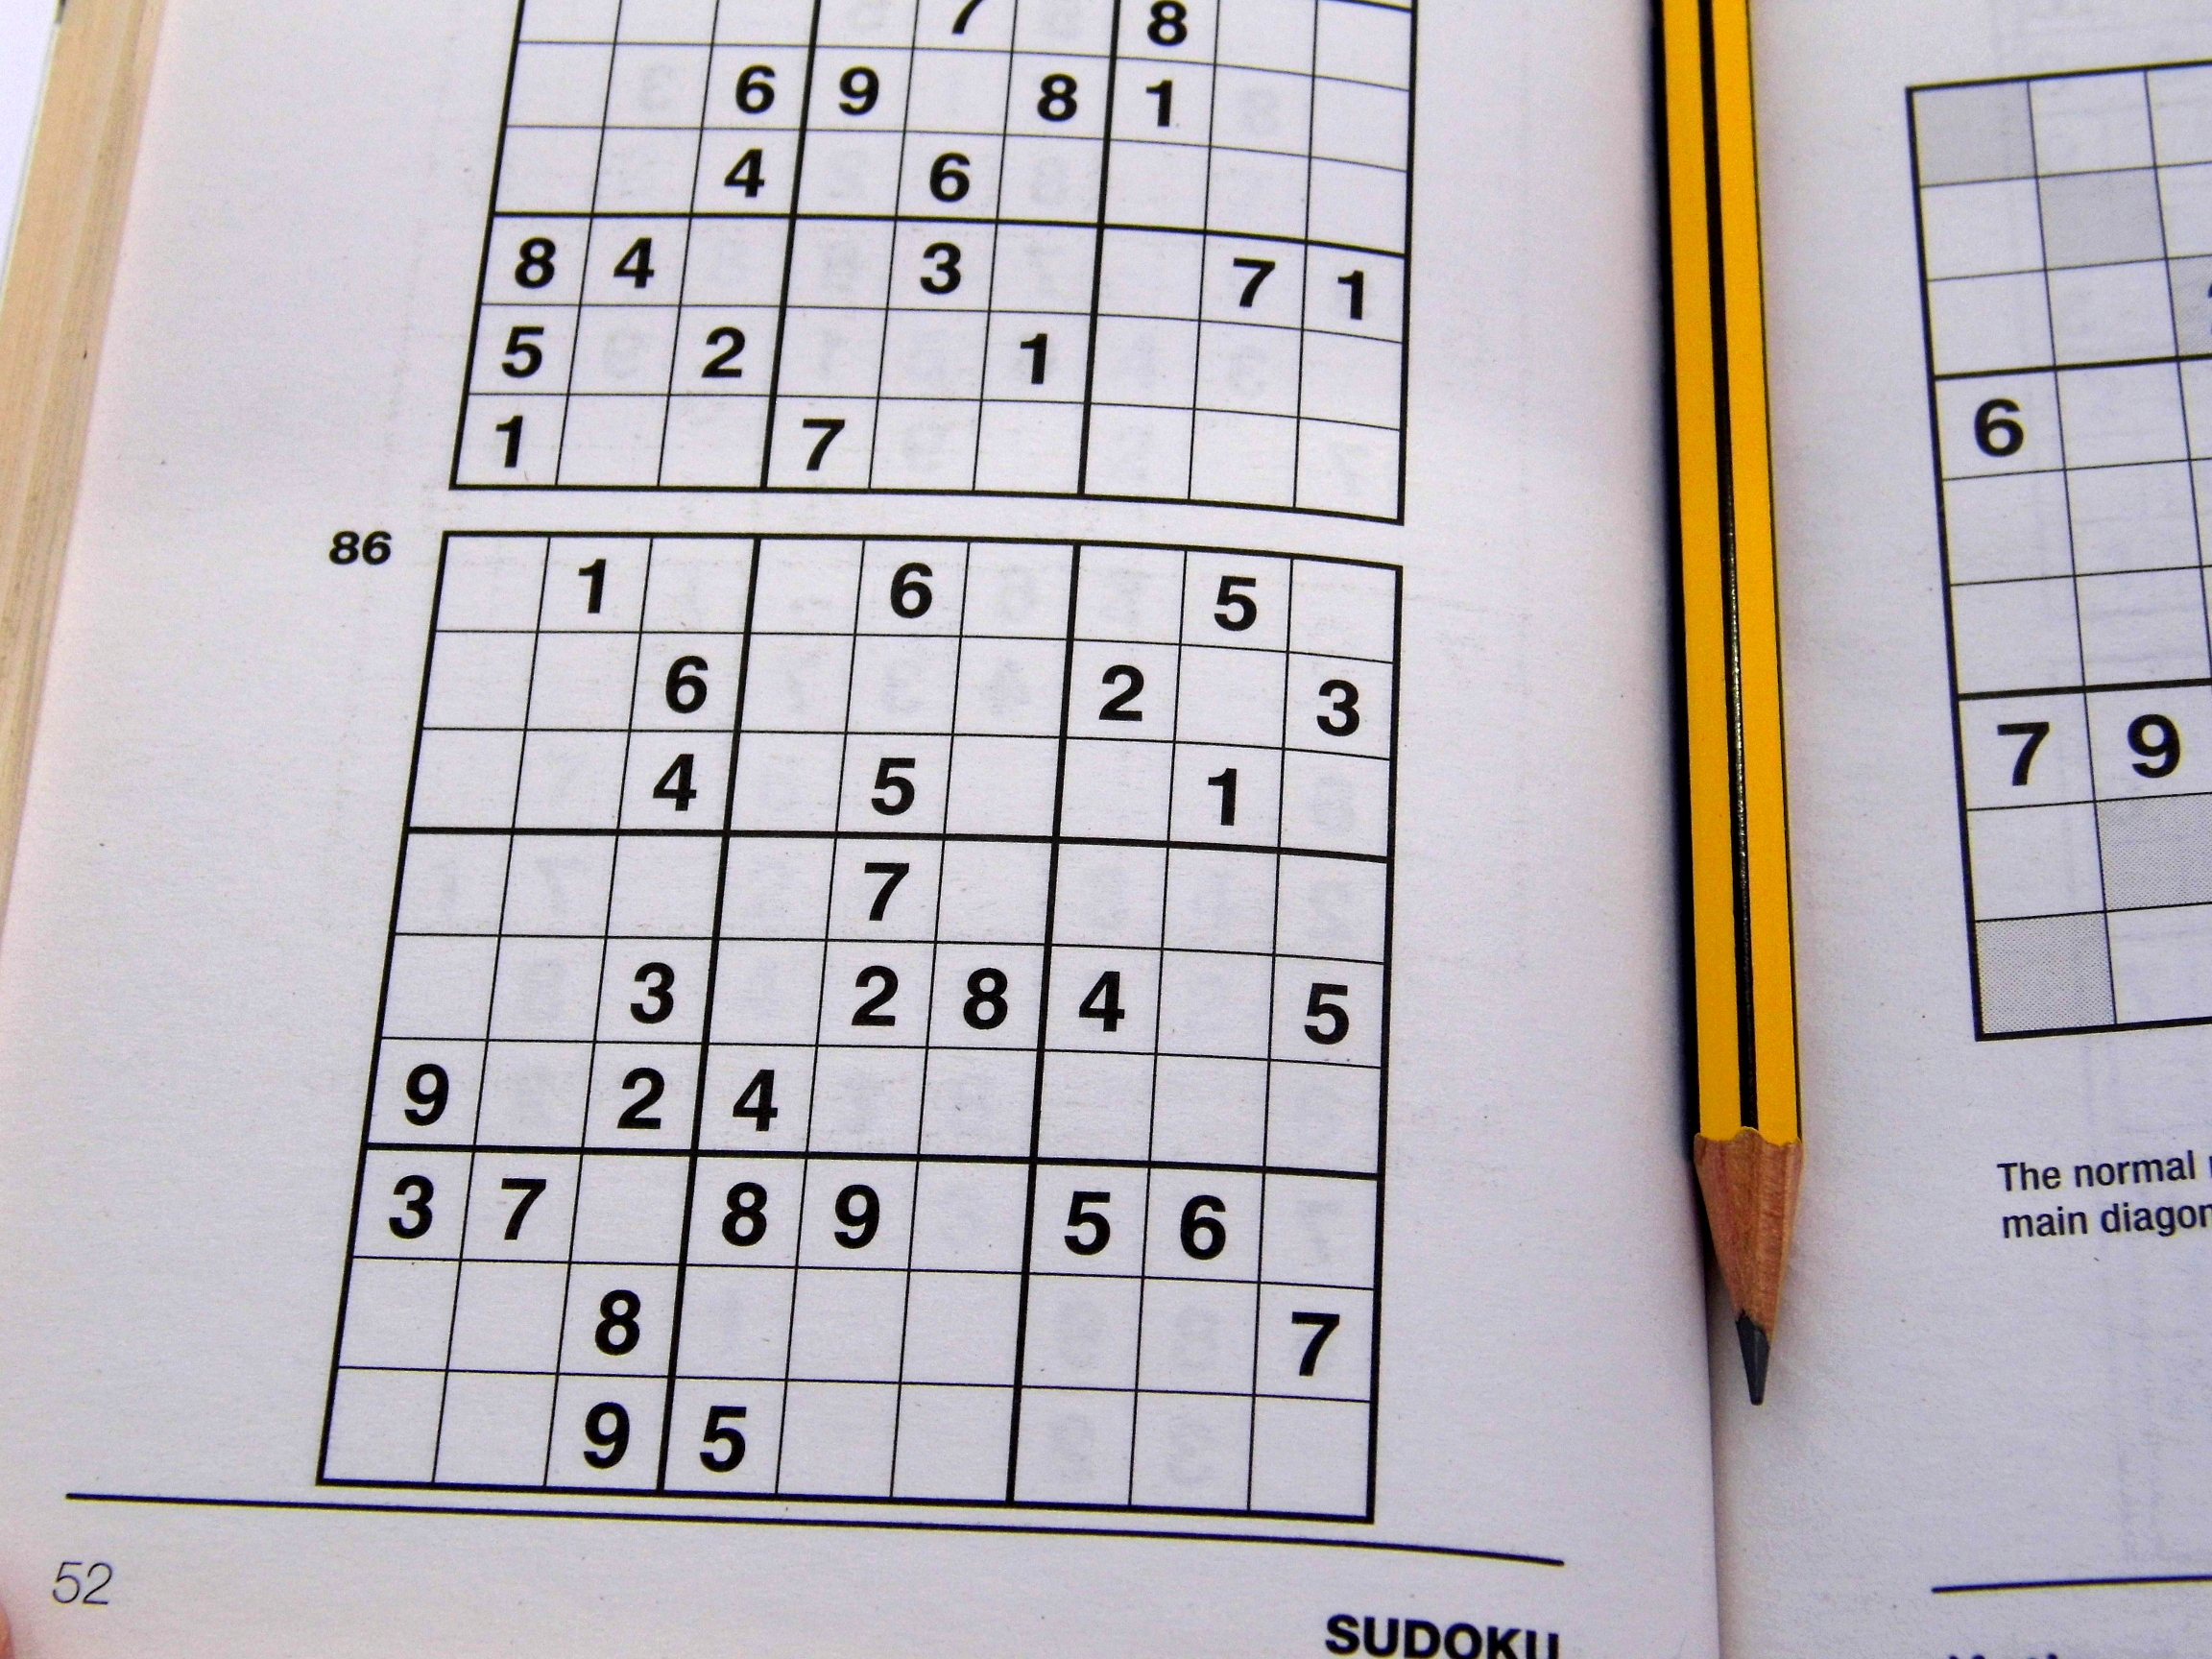 Archive Puzzles – 24 Evil Sudoku Puzzles – Books 1 To 10